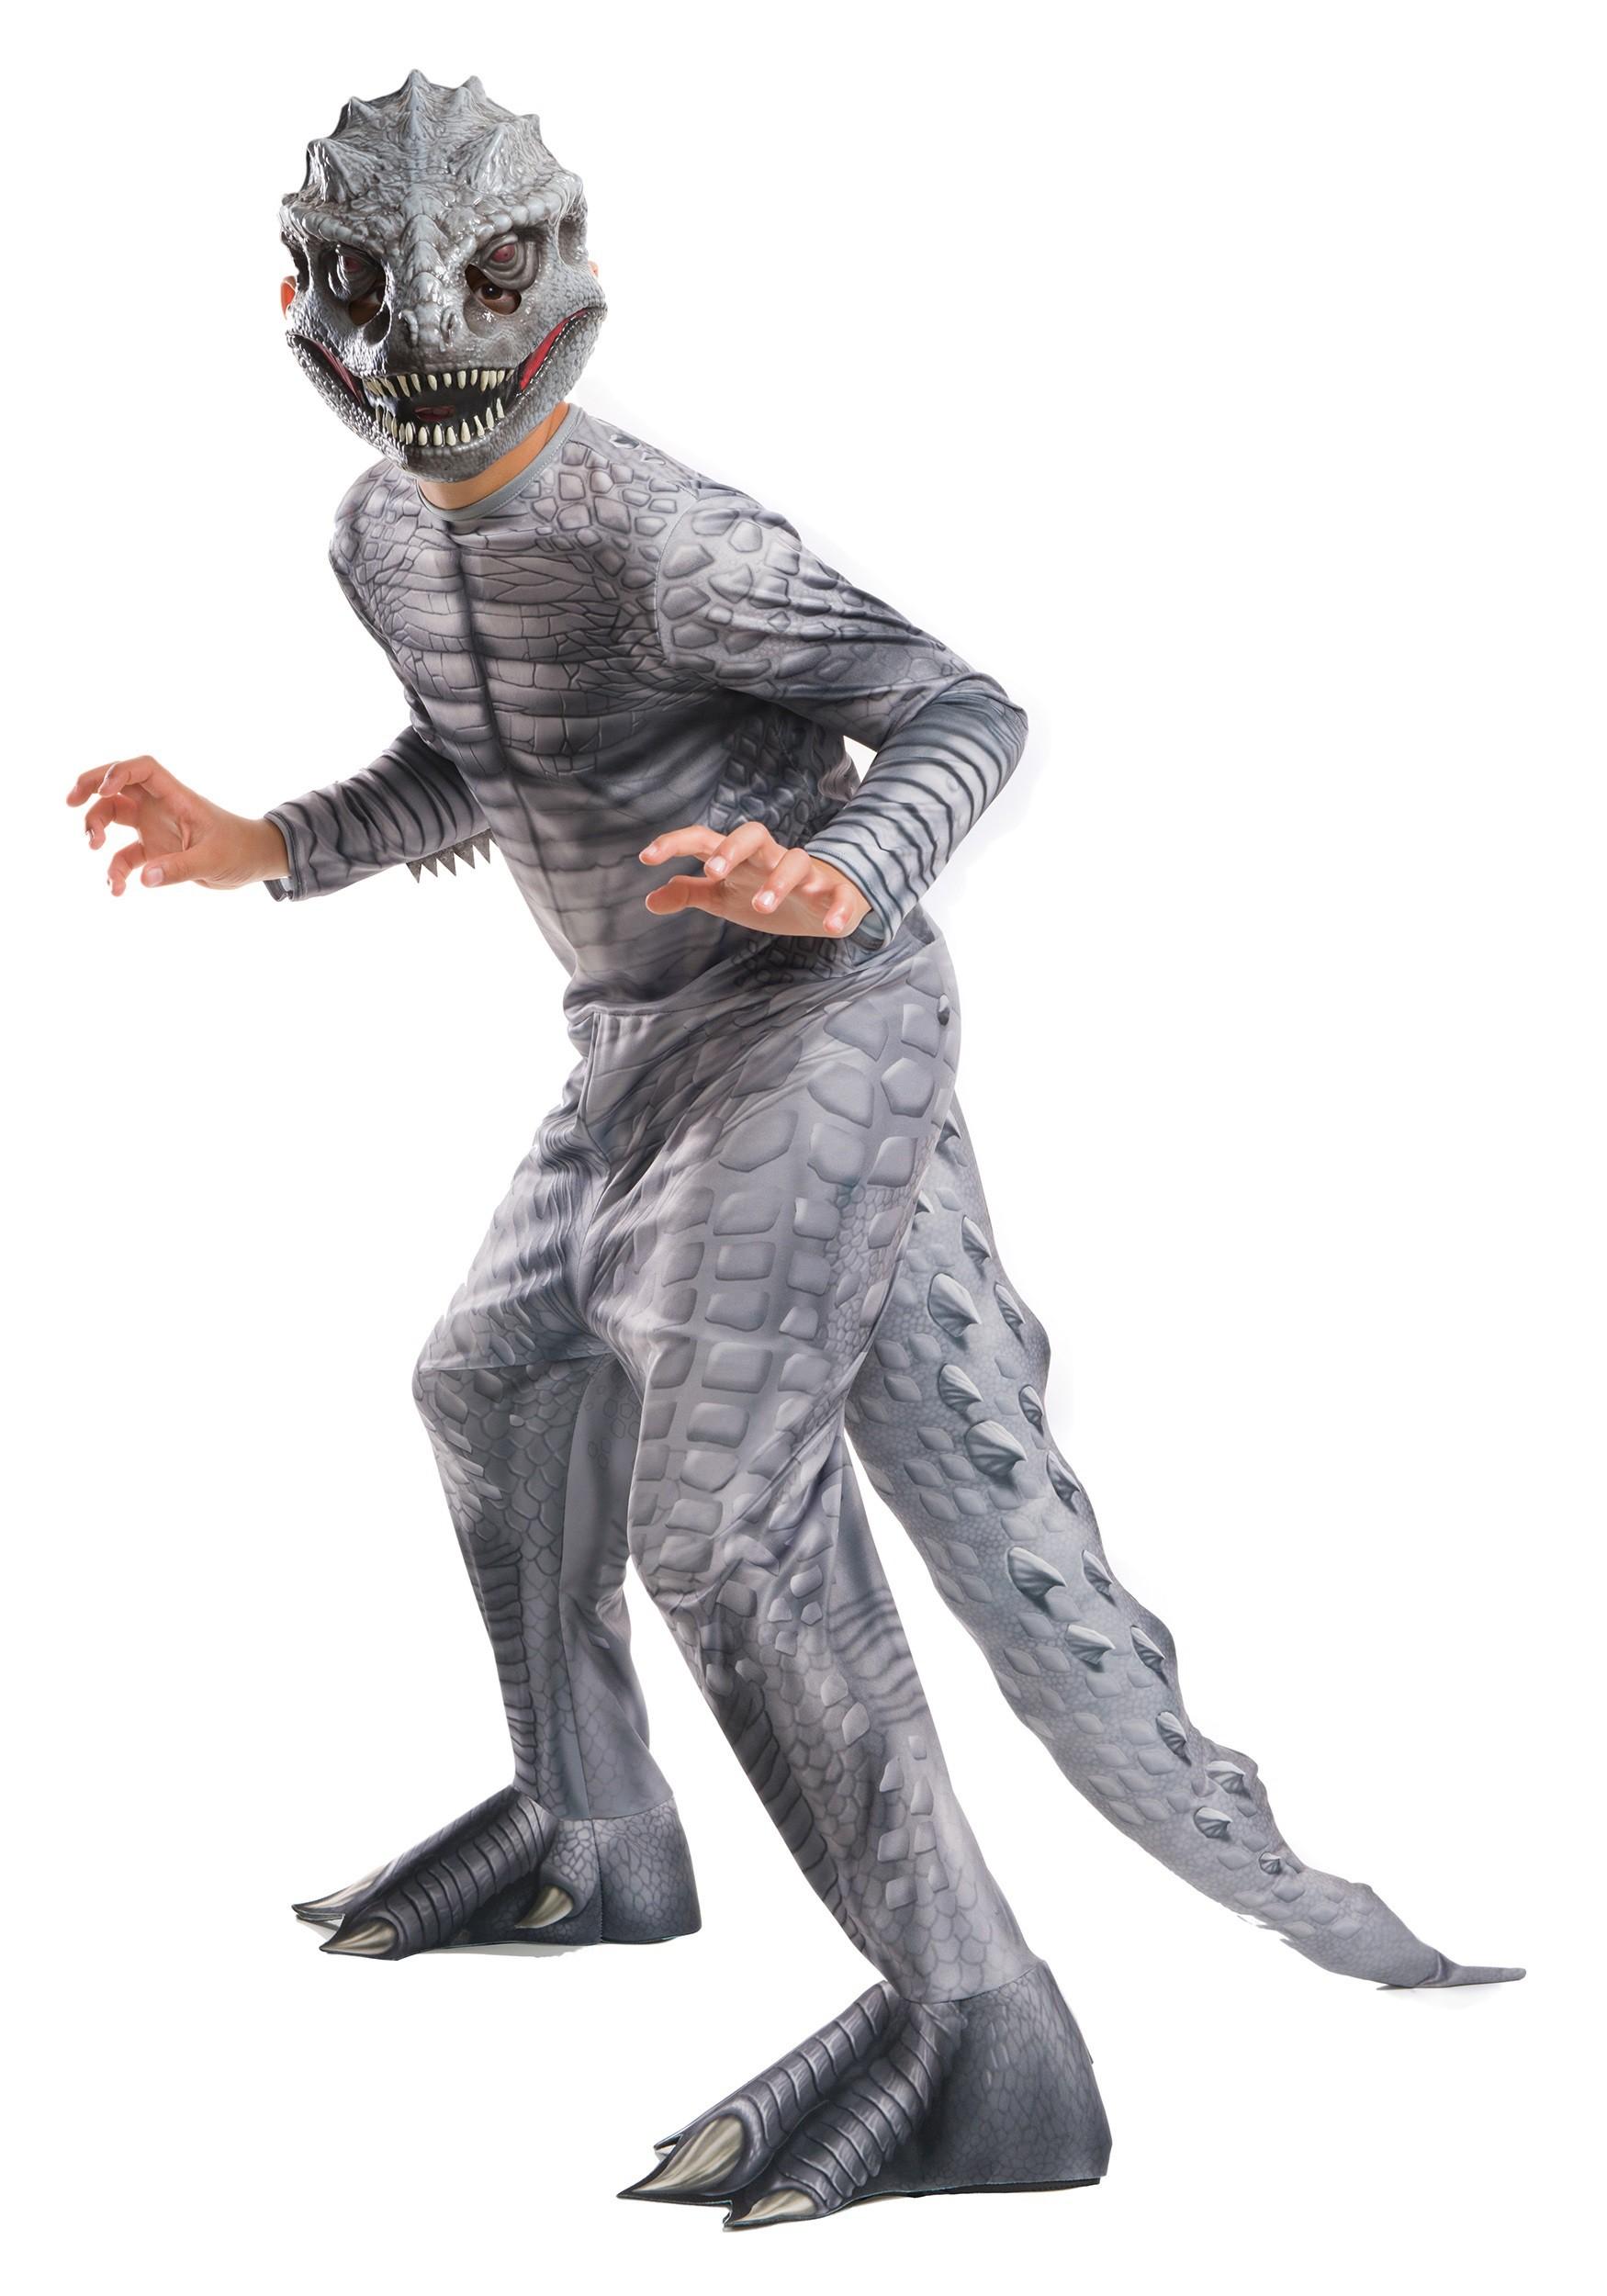 Jurassic Park Costumes